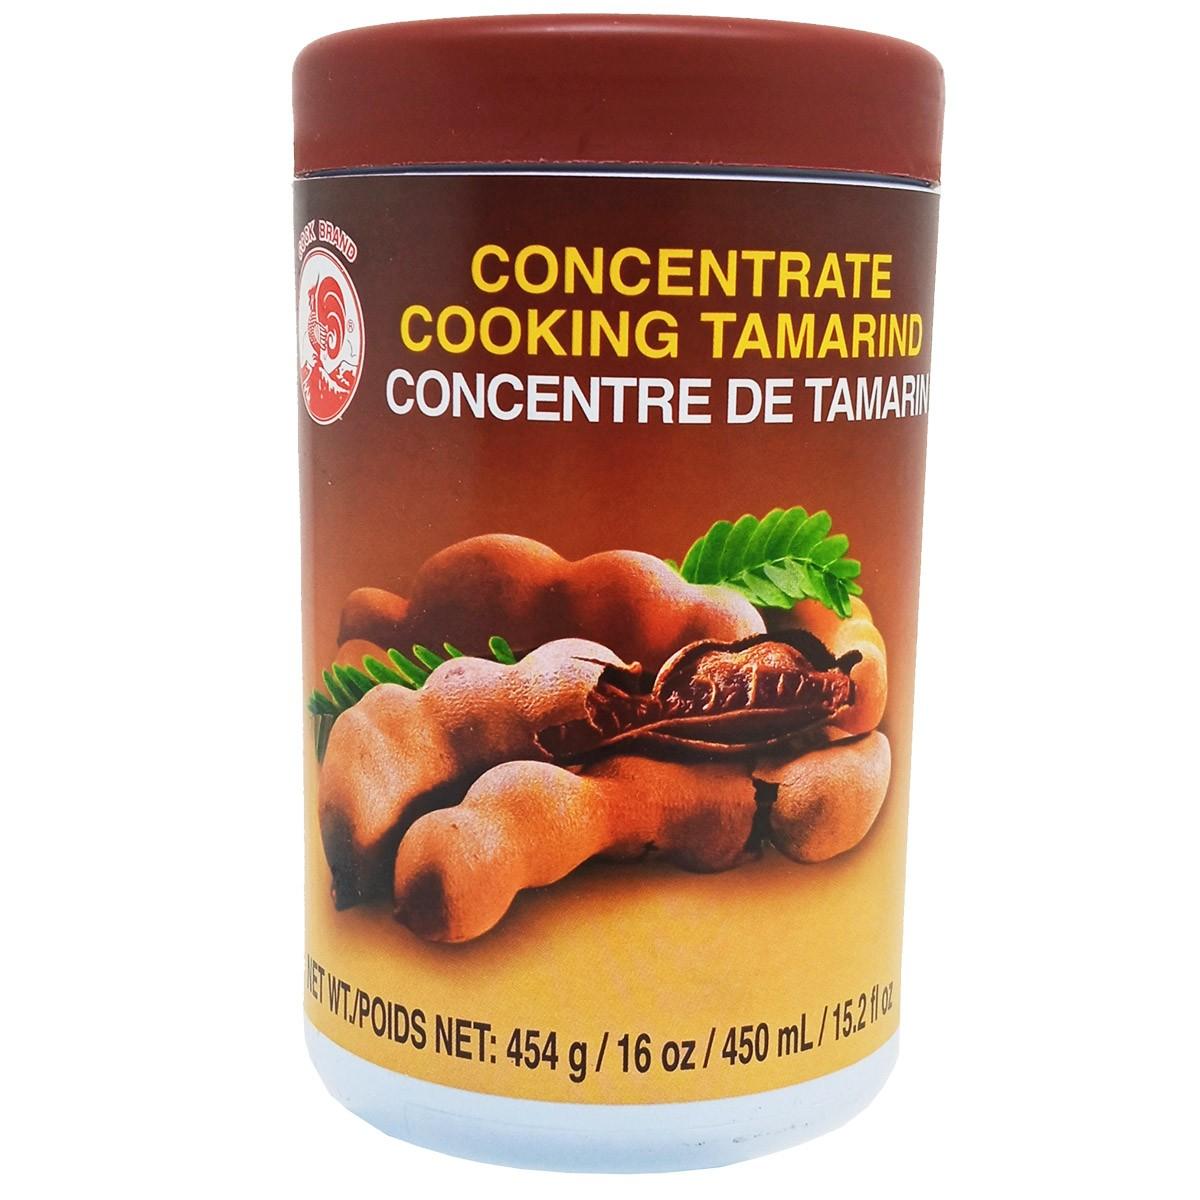 Pasta Concentrada de Tamarindo 454g 450mL - Cock Brand